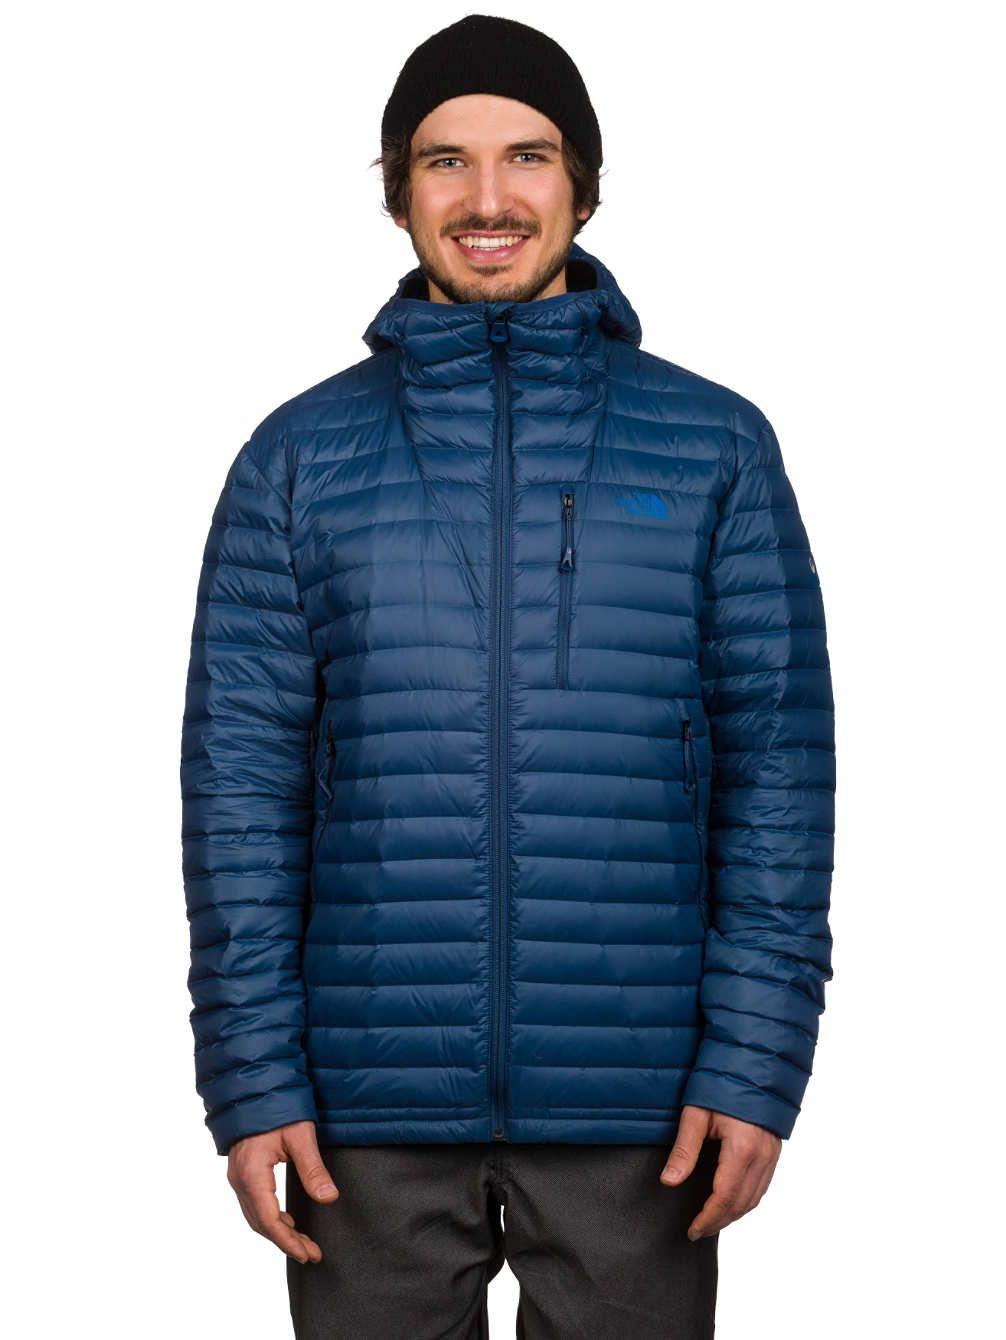 765d8e8dfe 30 Best Of north Face Premonition Jacket Smart Ideas -